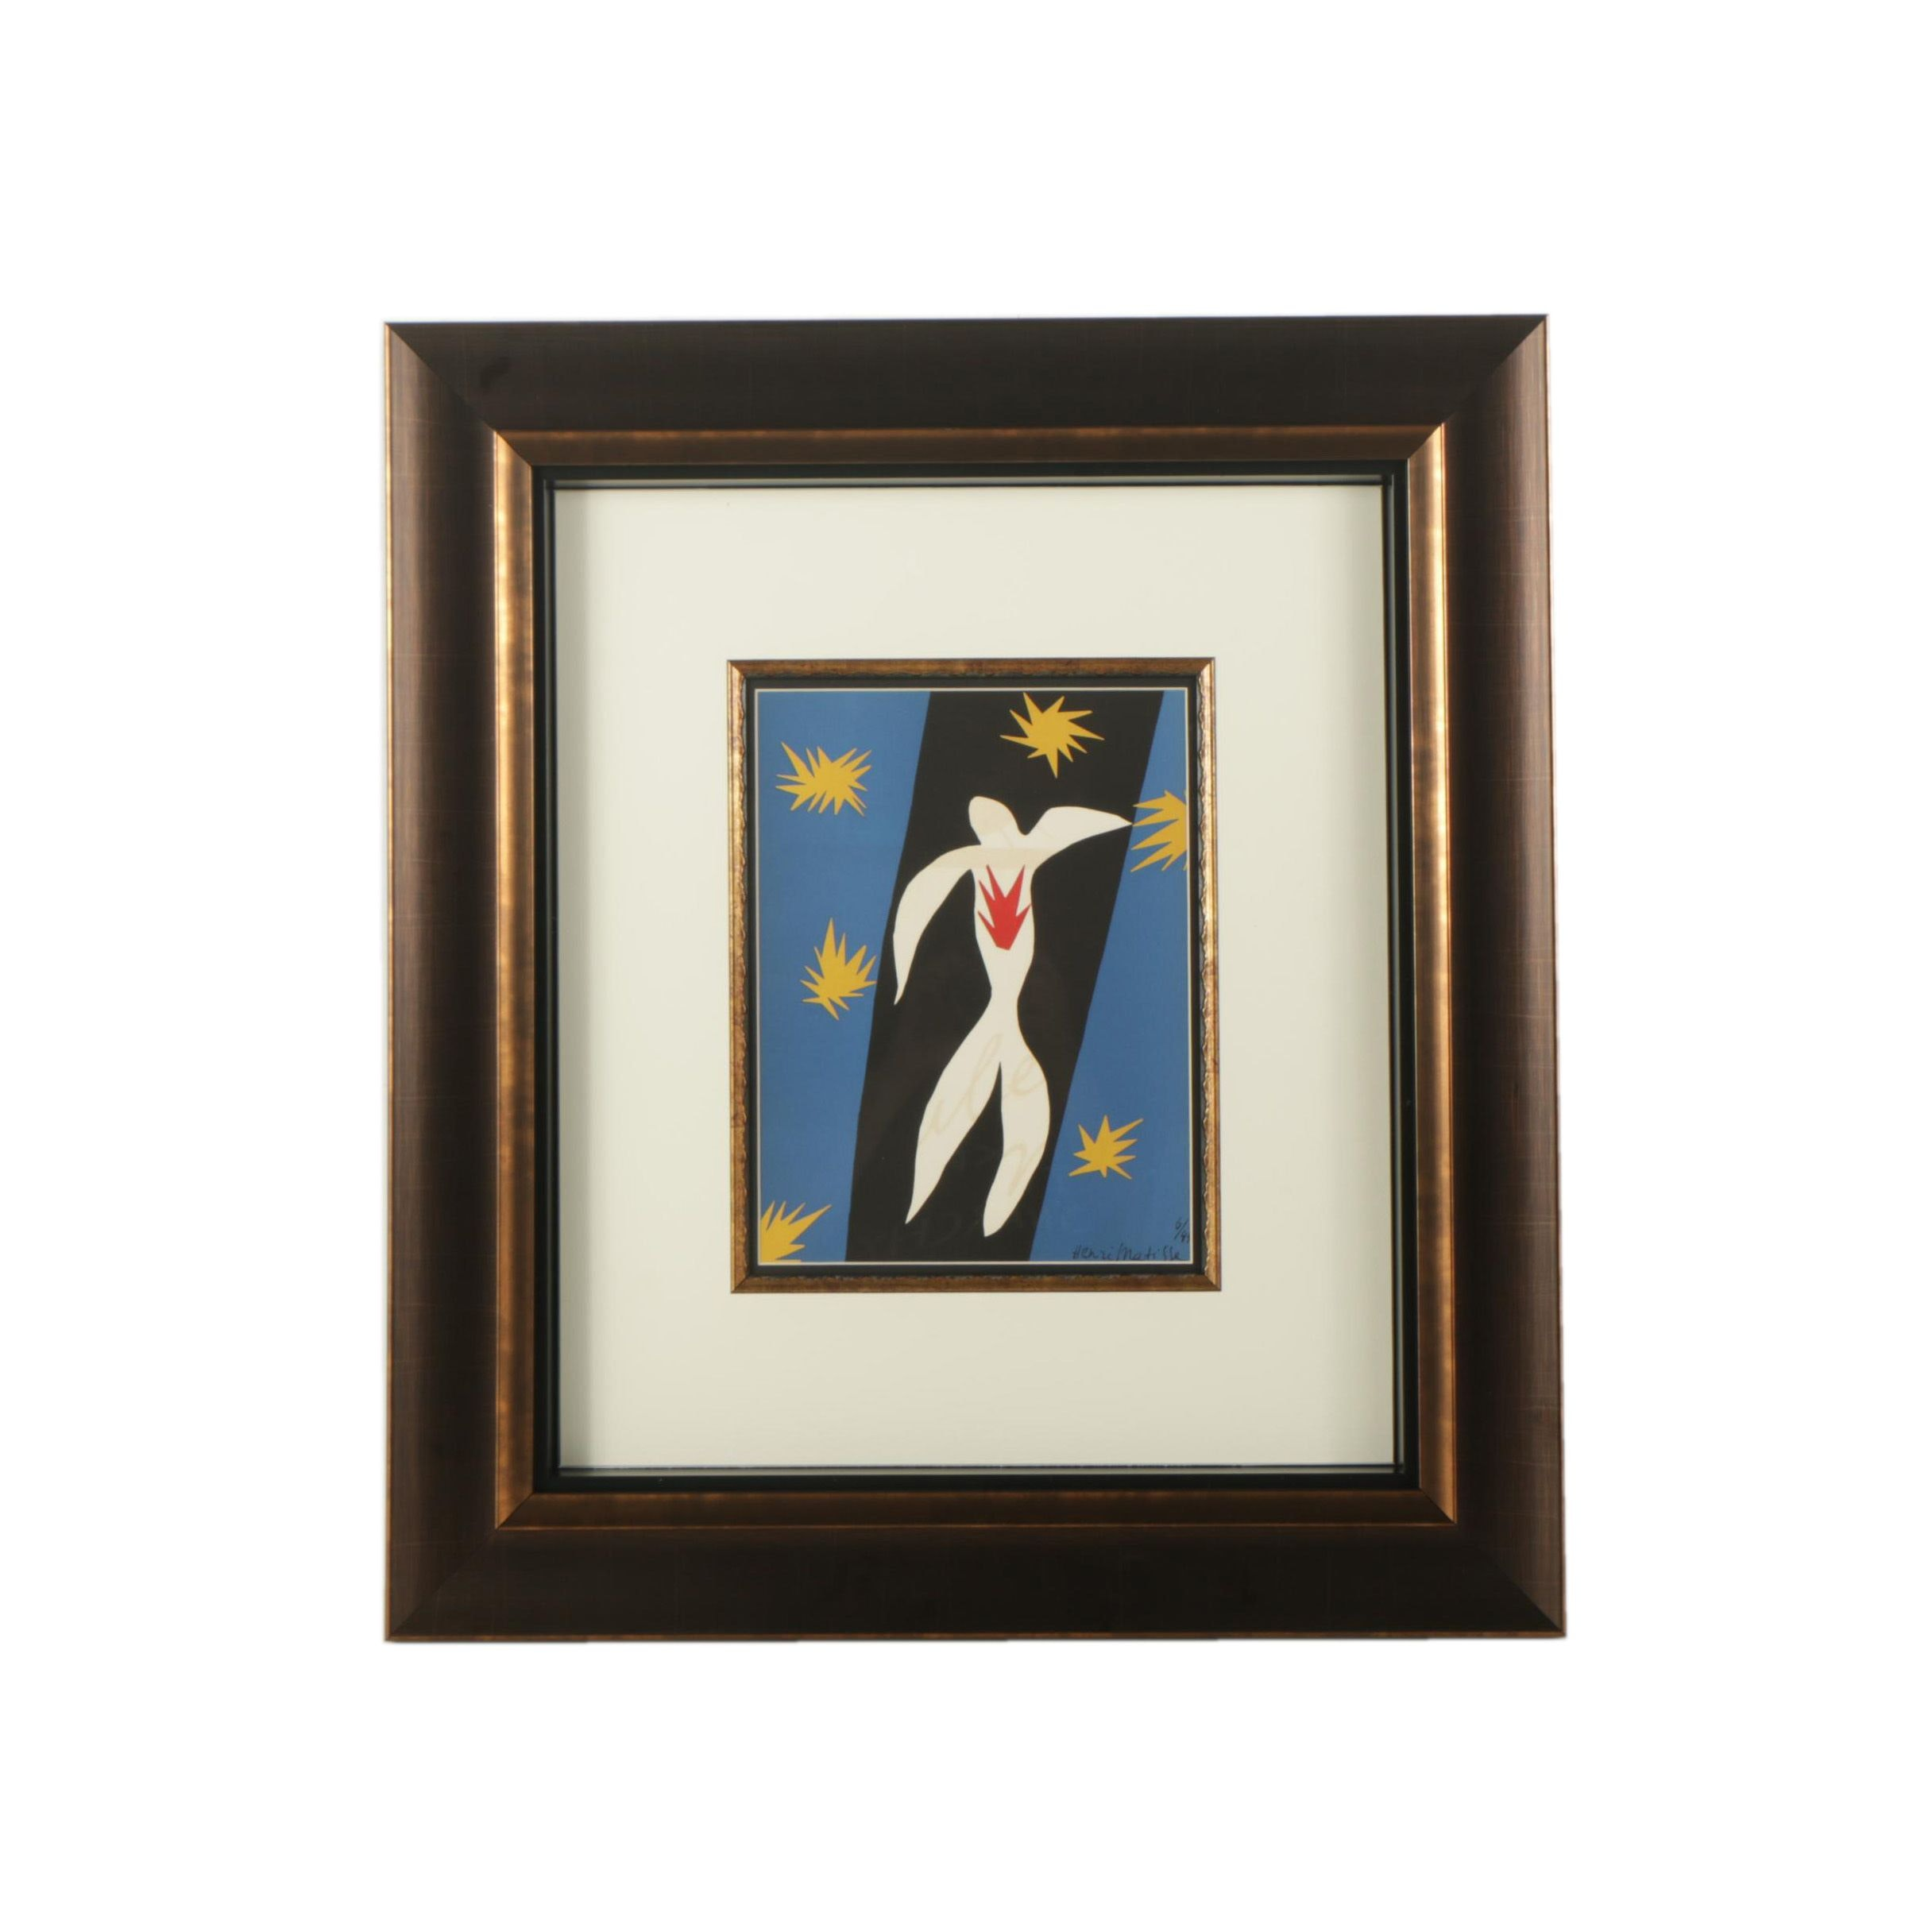 "Framed Lithograph After Henri Matisse ""La Chute d'Icare"""